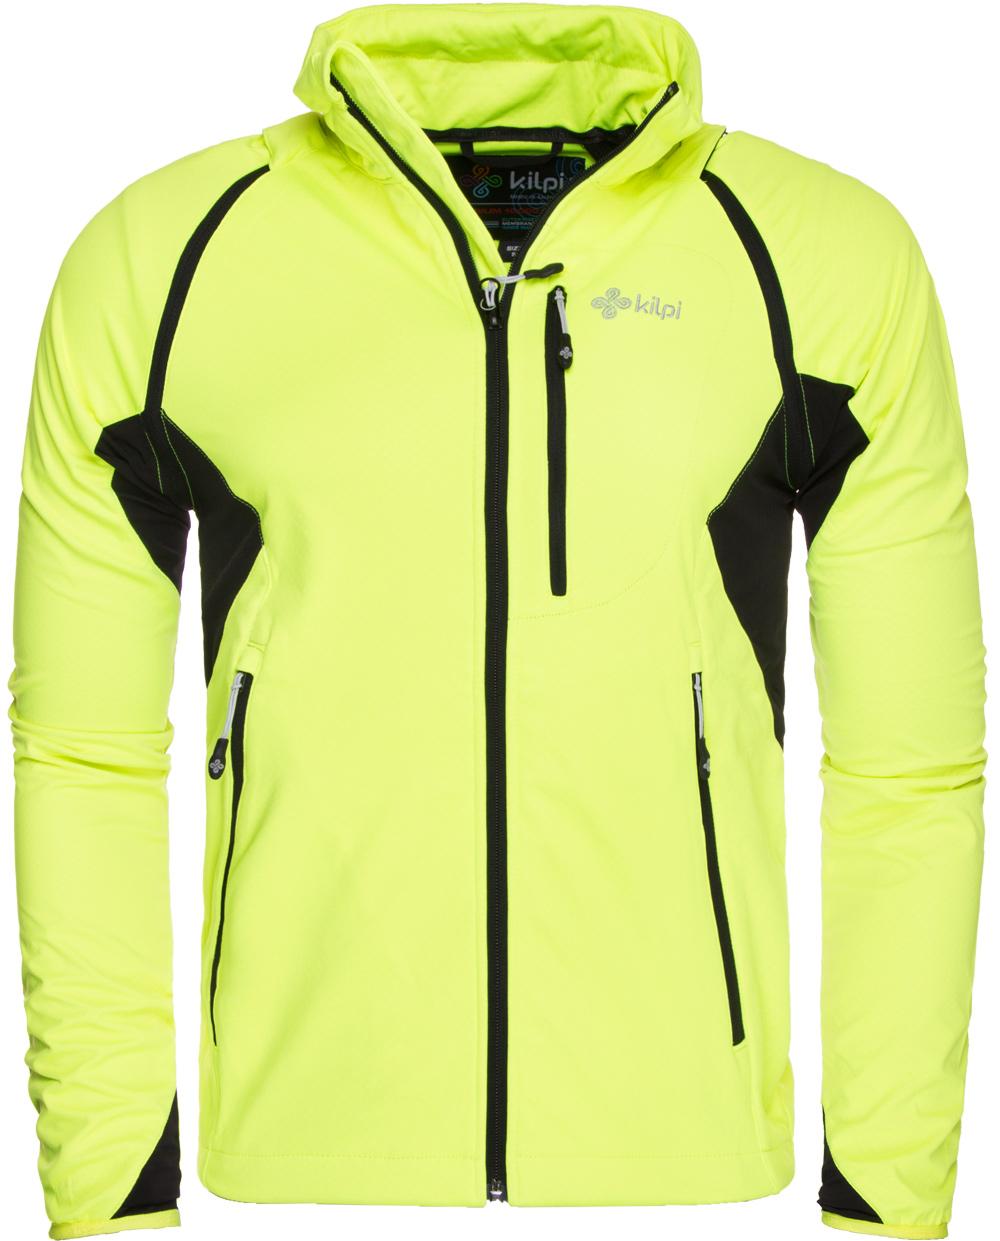 Softshell men's jacket Kilpi TRANSFORMER-M